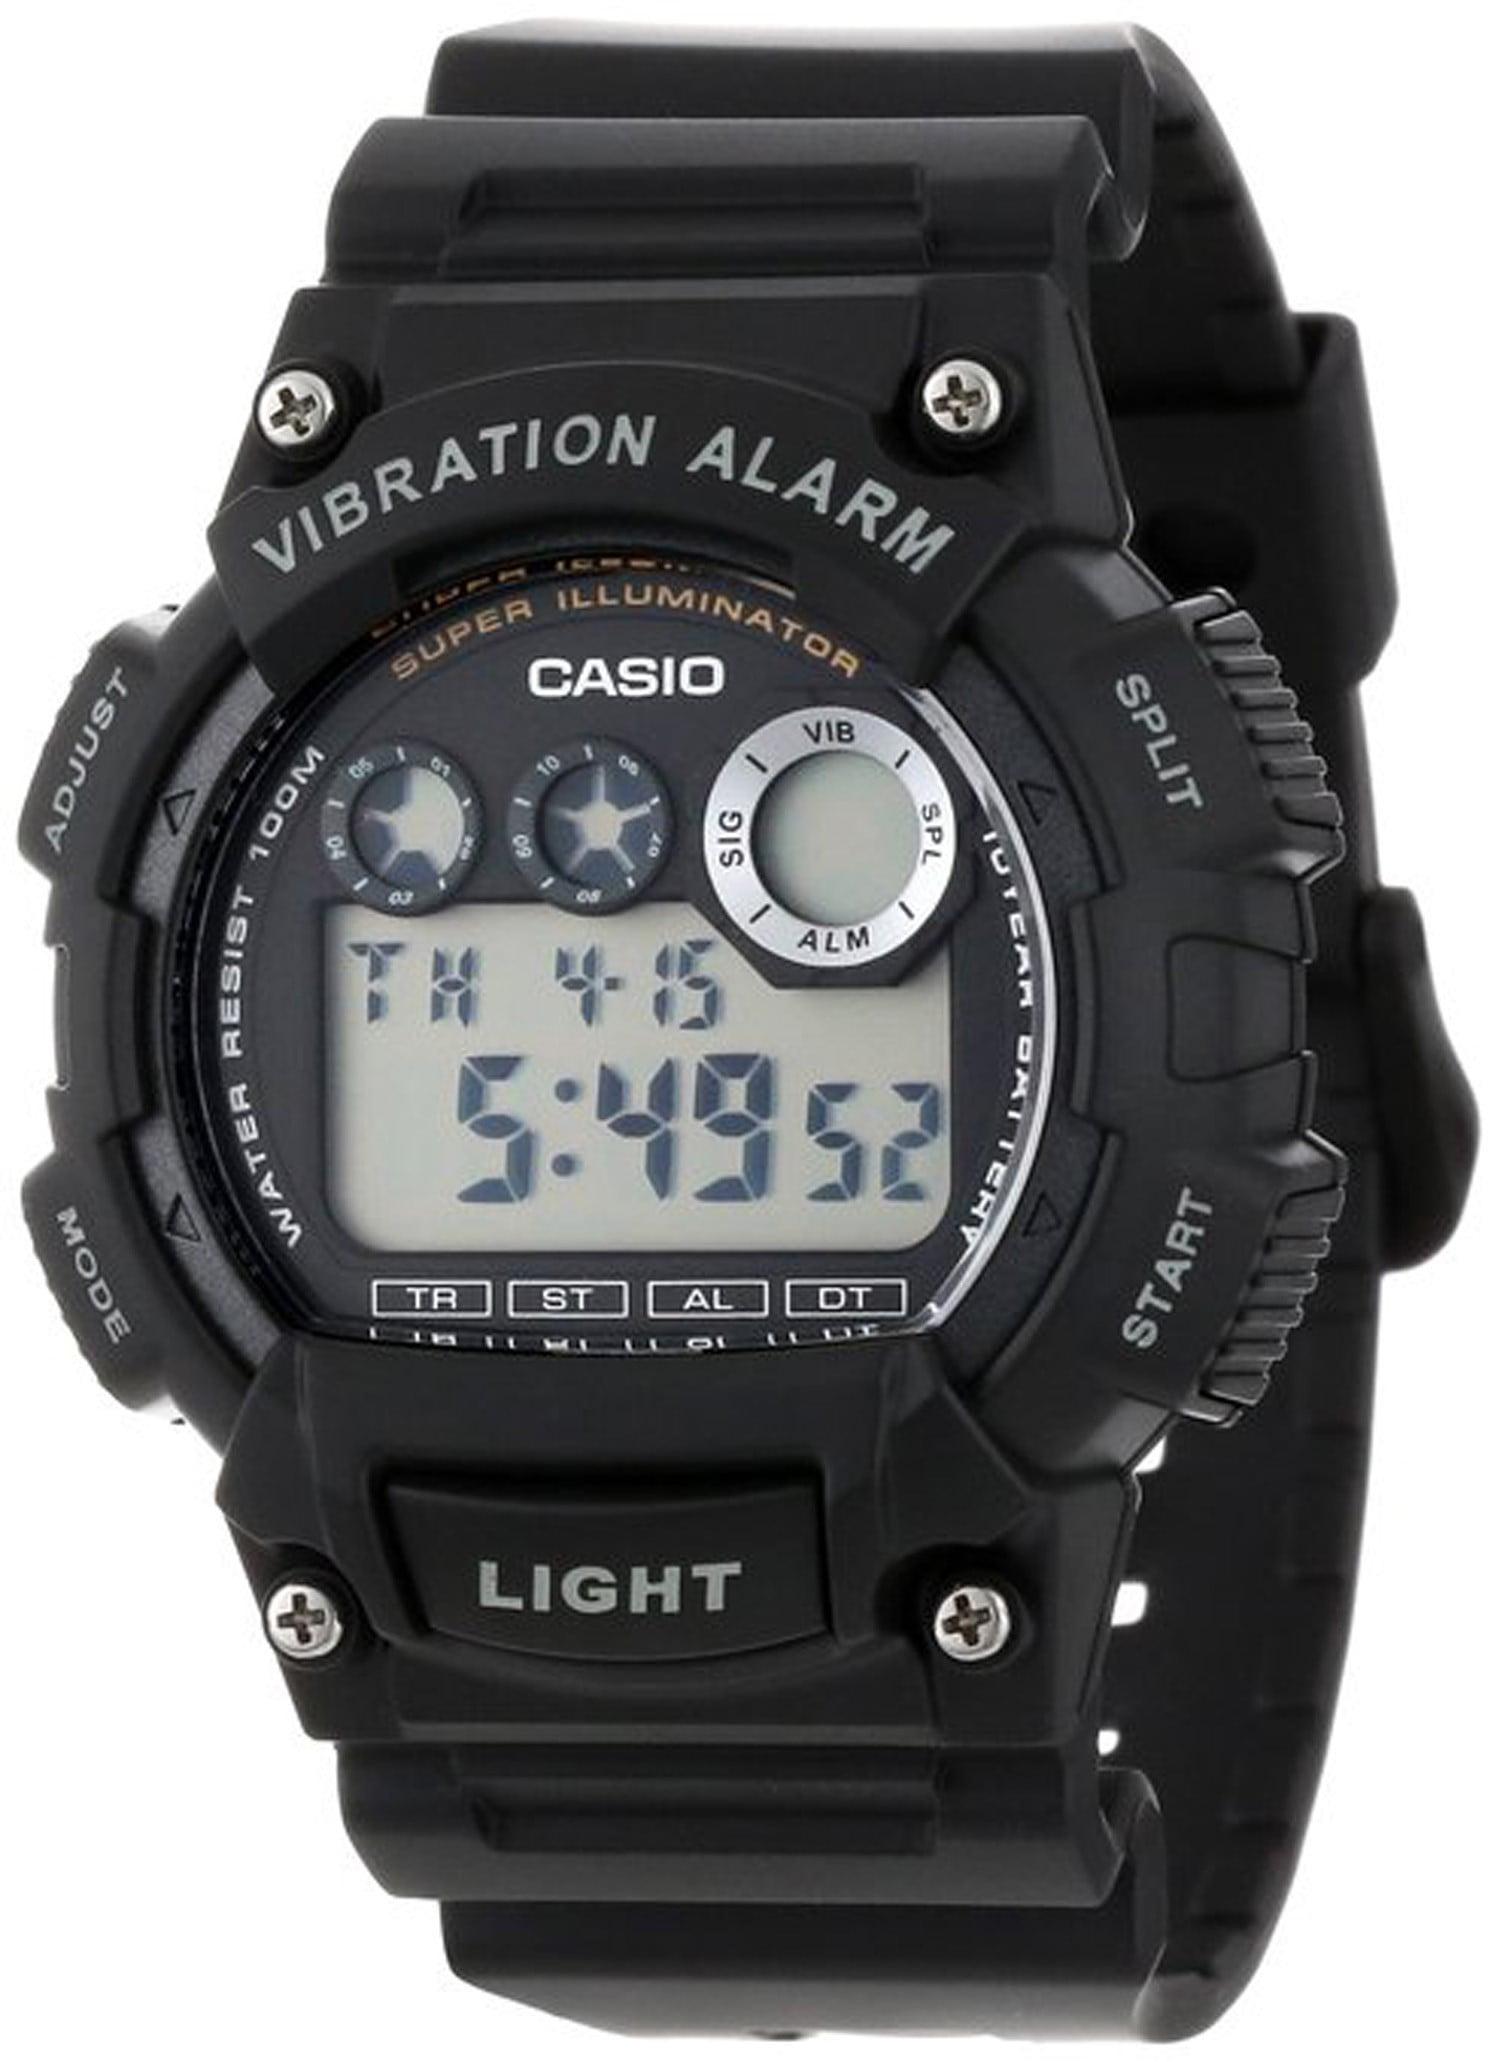 2d2d4df250b0 Casio - Men s Sport Digital Watch